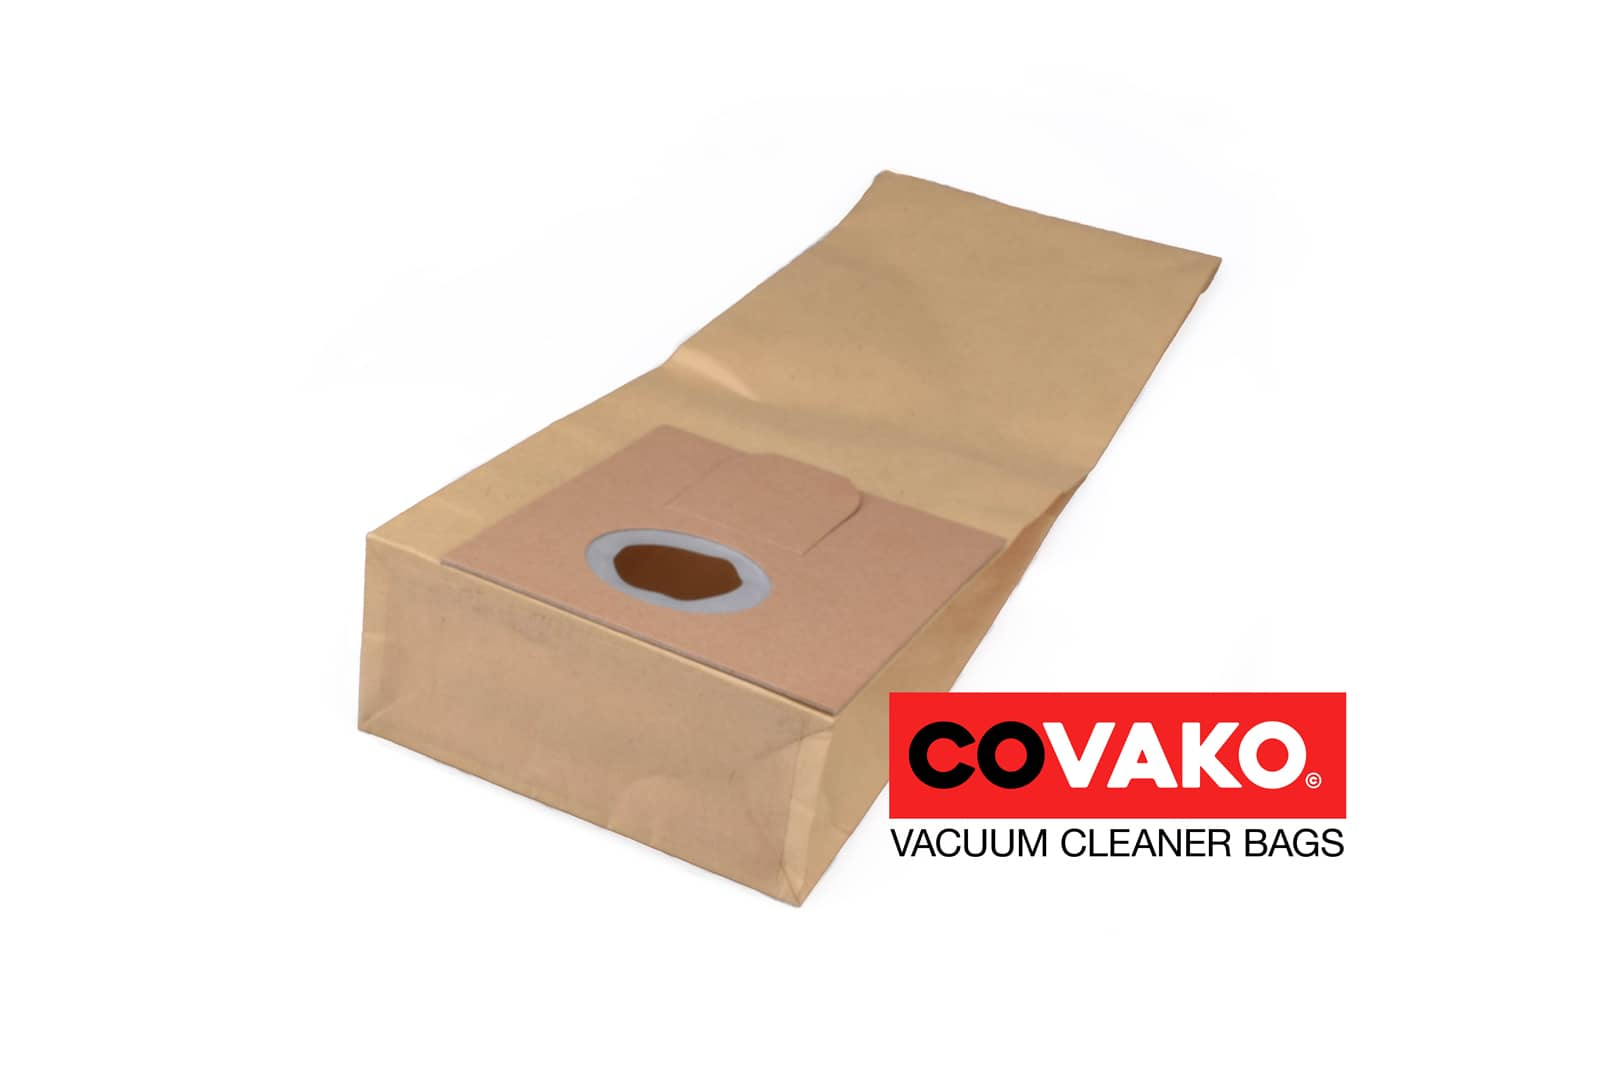 Ivac UP 350 / Papier - Ivac stofzuigerzakken